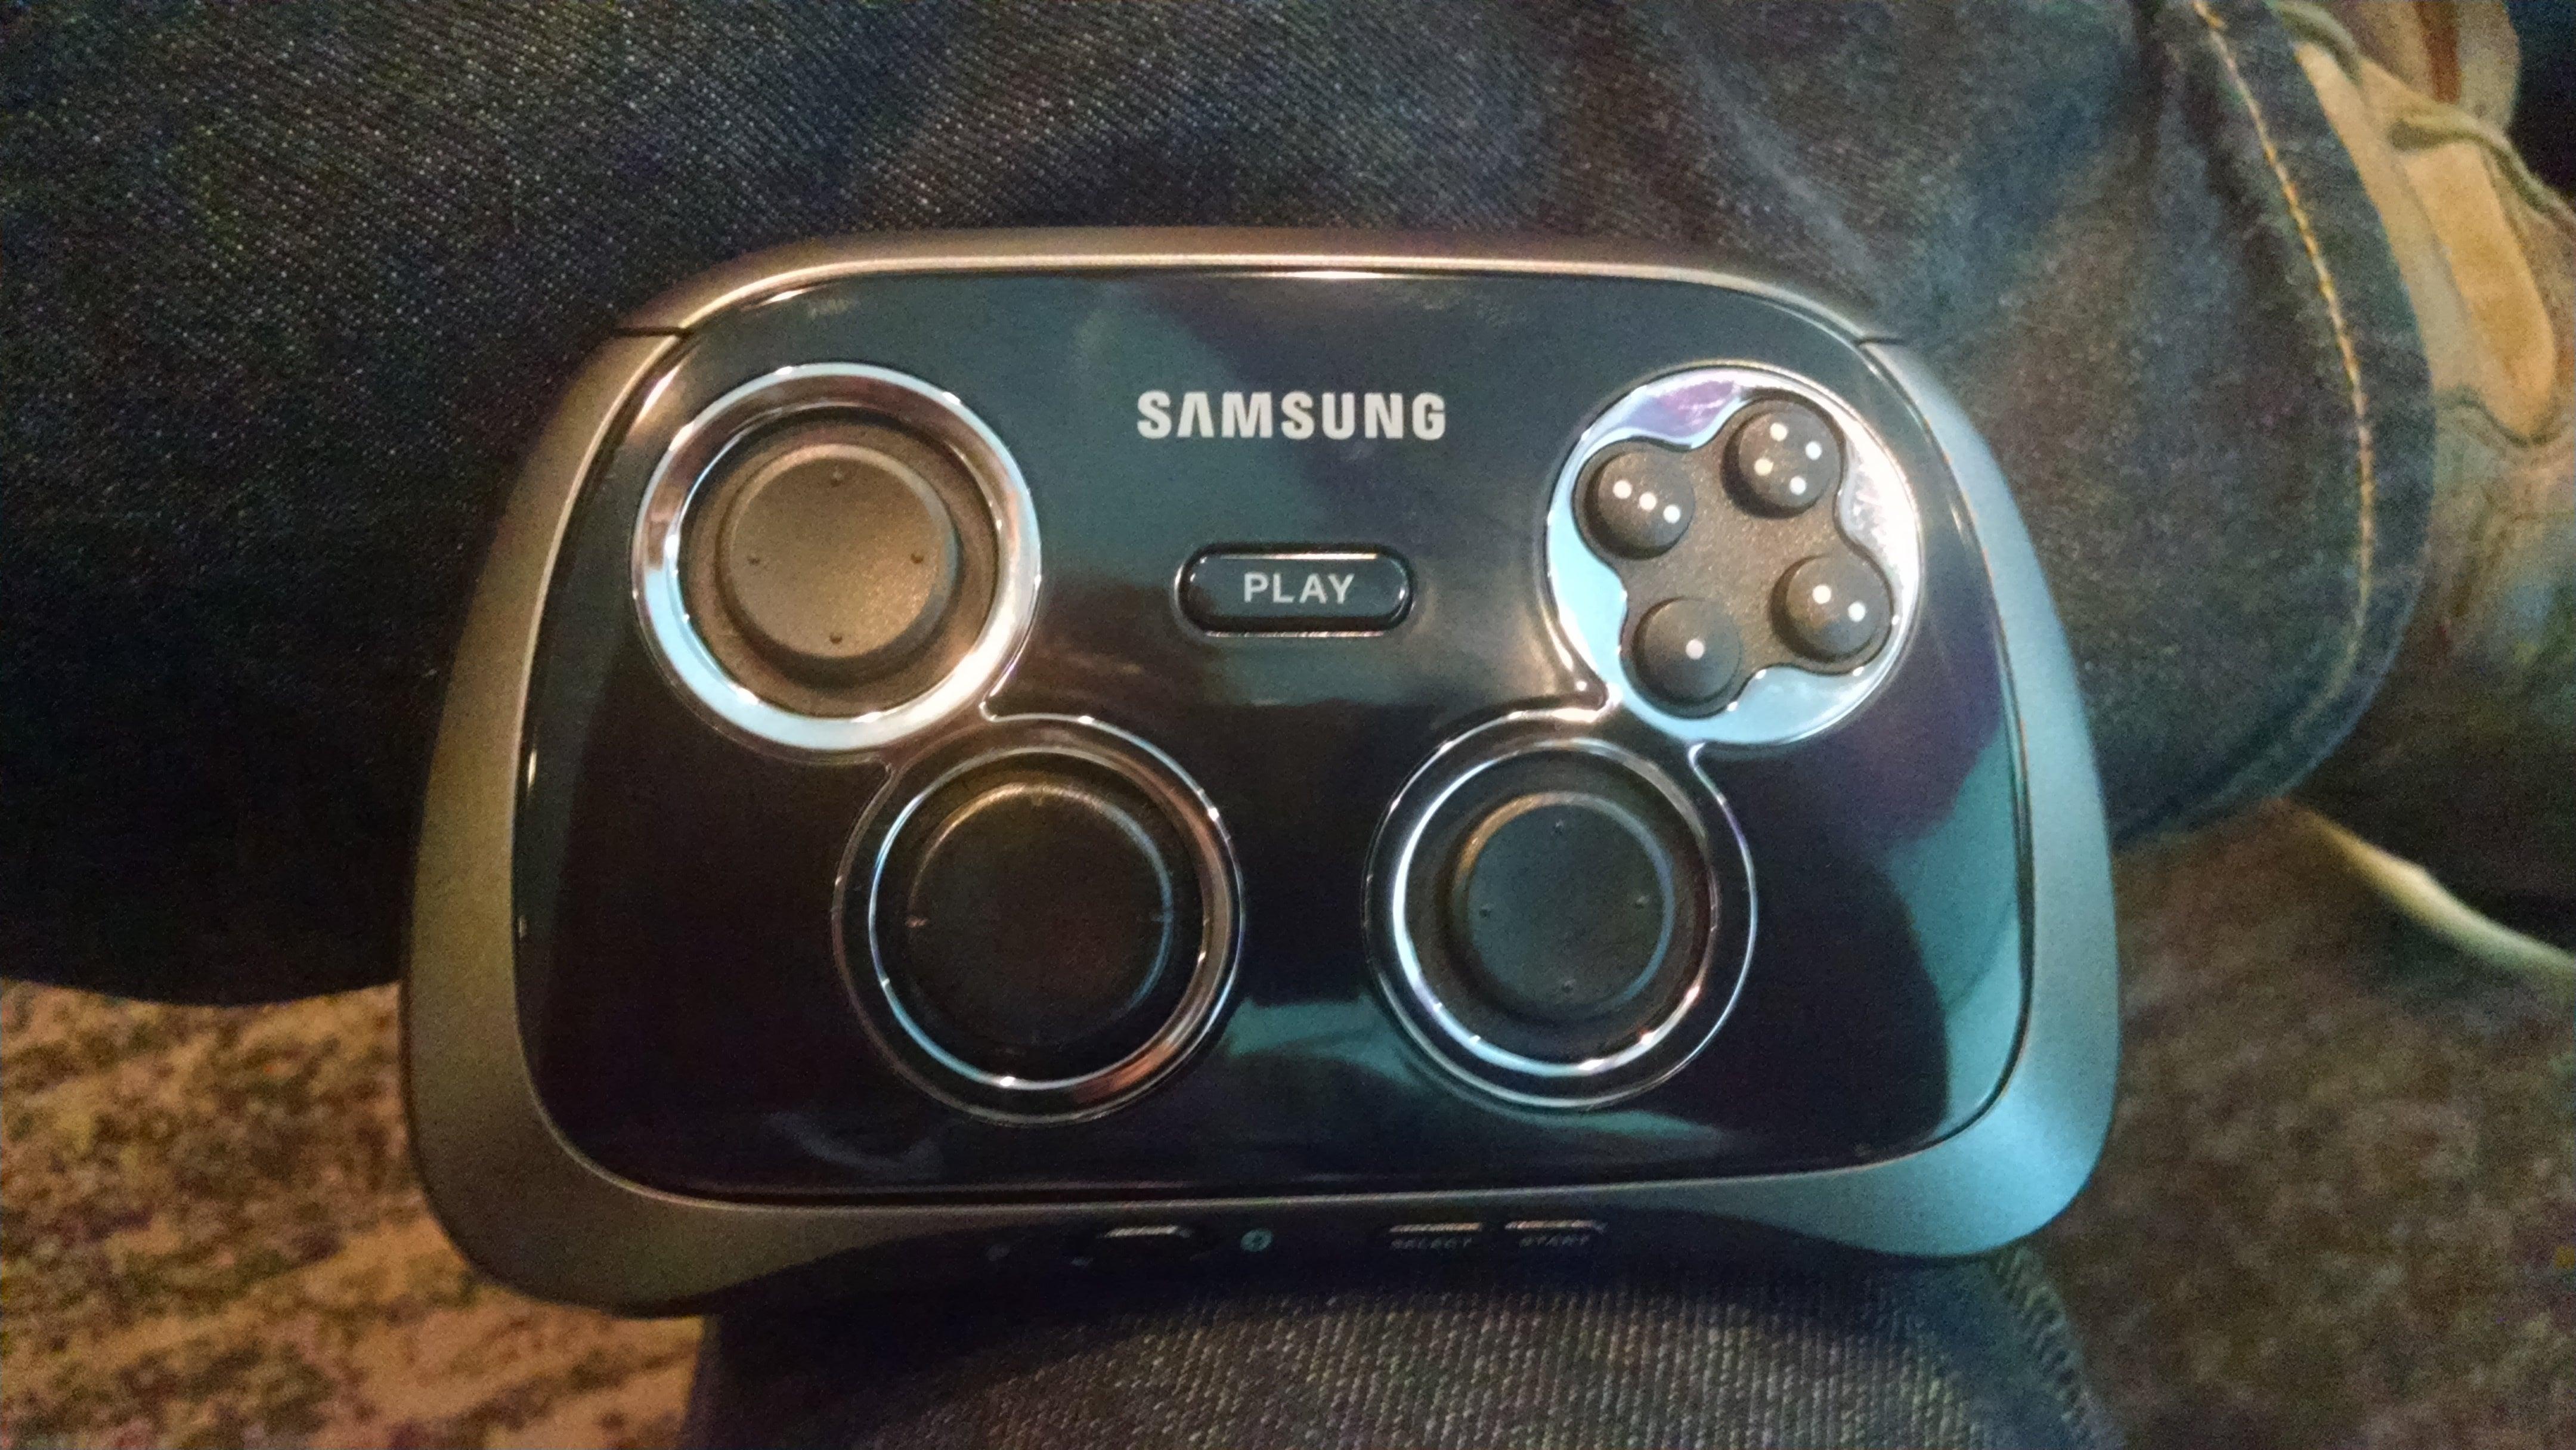 Samsung Gear VR headset hands-on: Better than the Oculus Rift (in